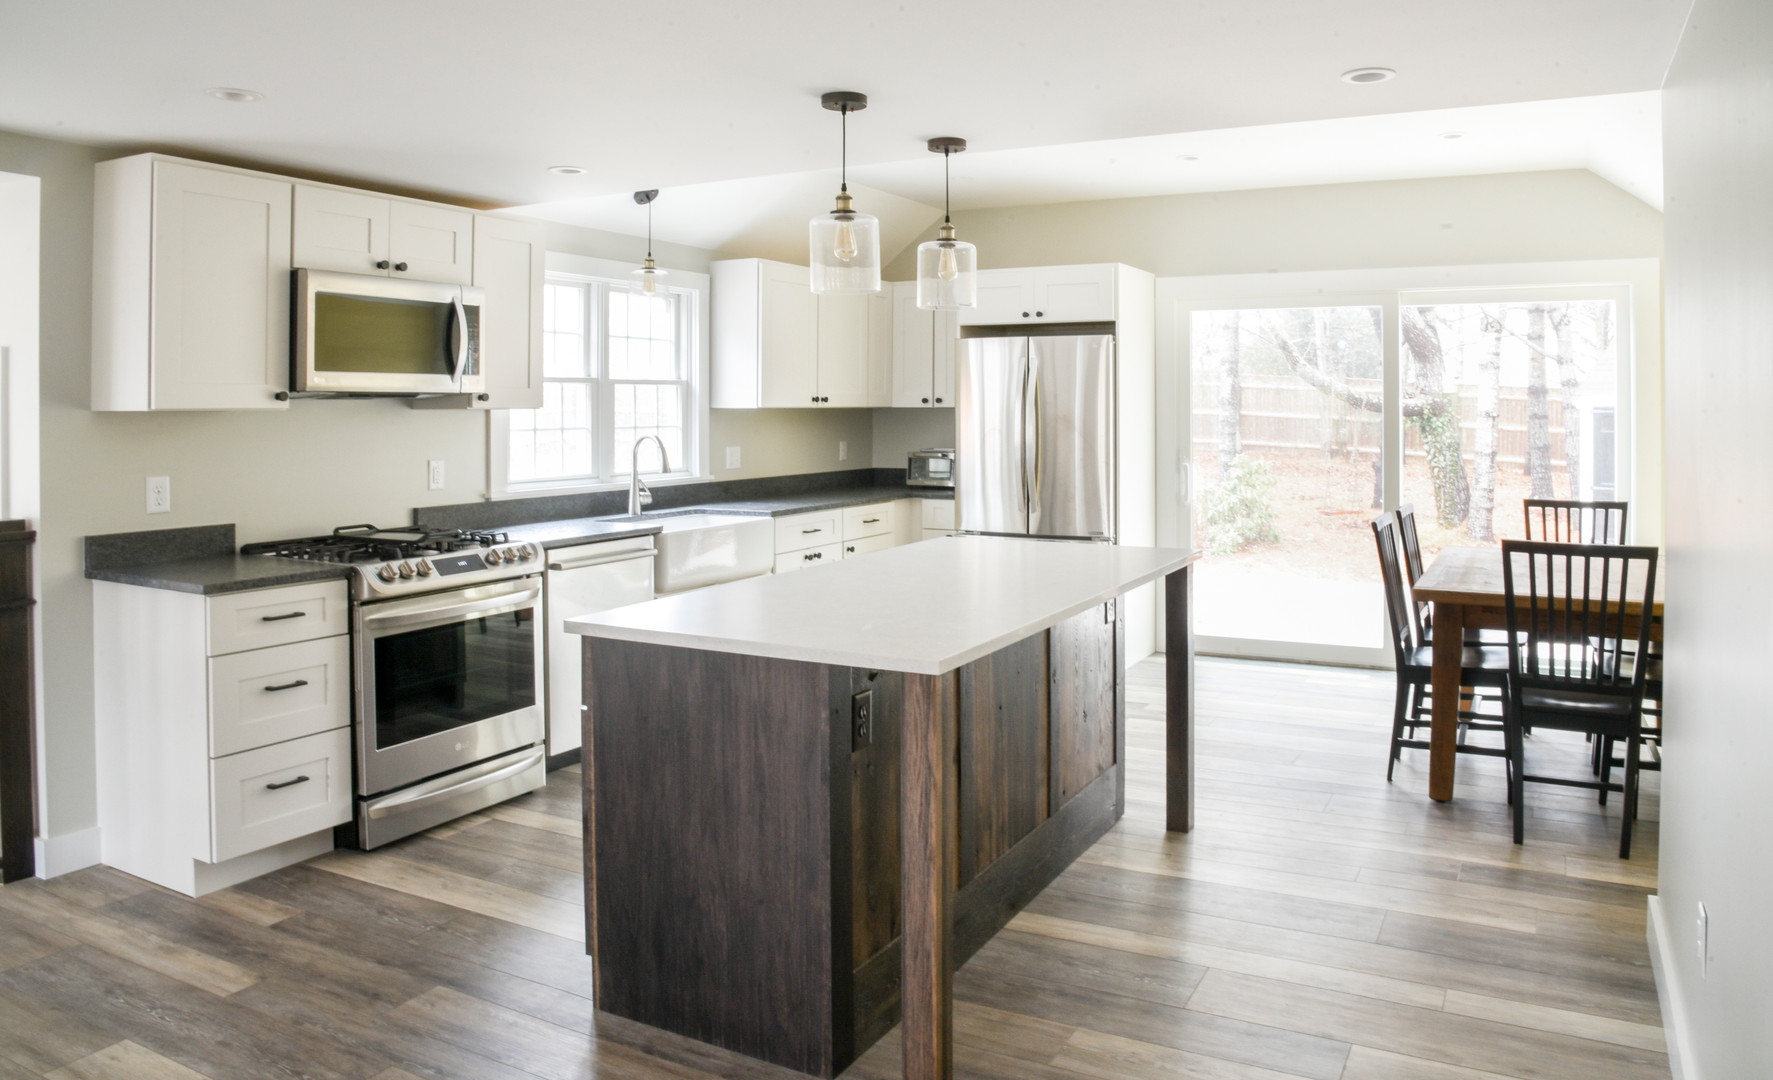 Renovated Kitchen, South Chatham